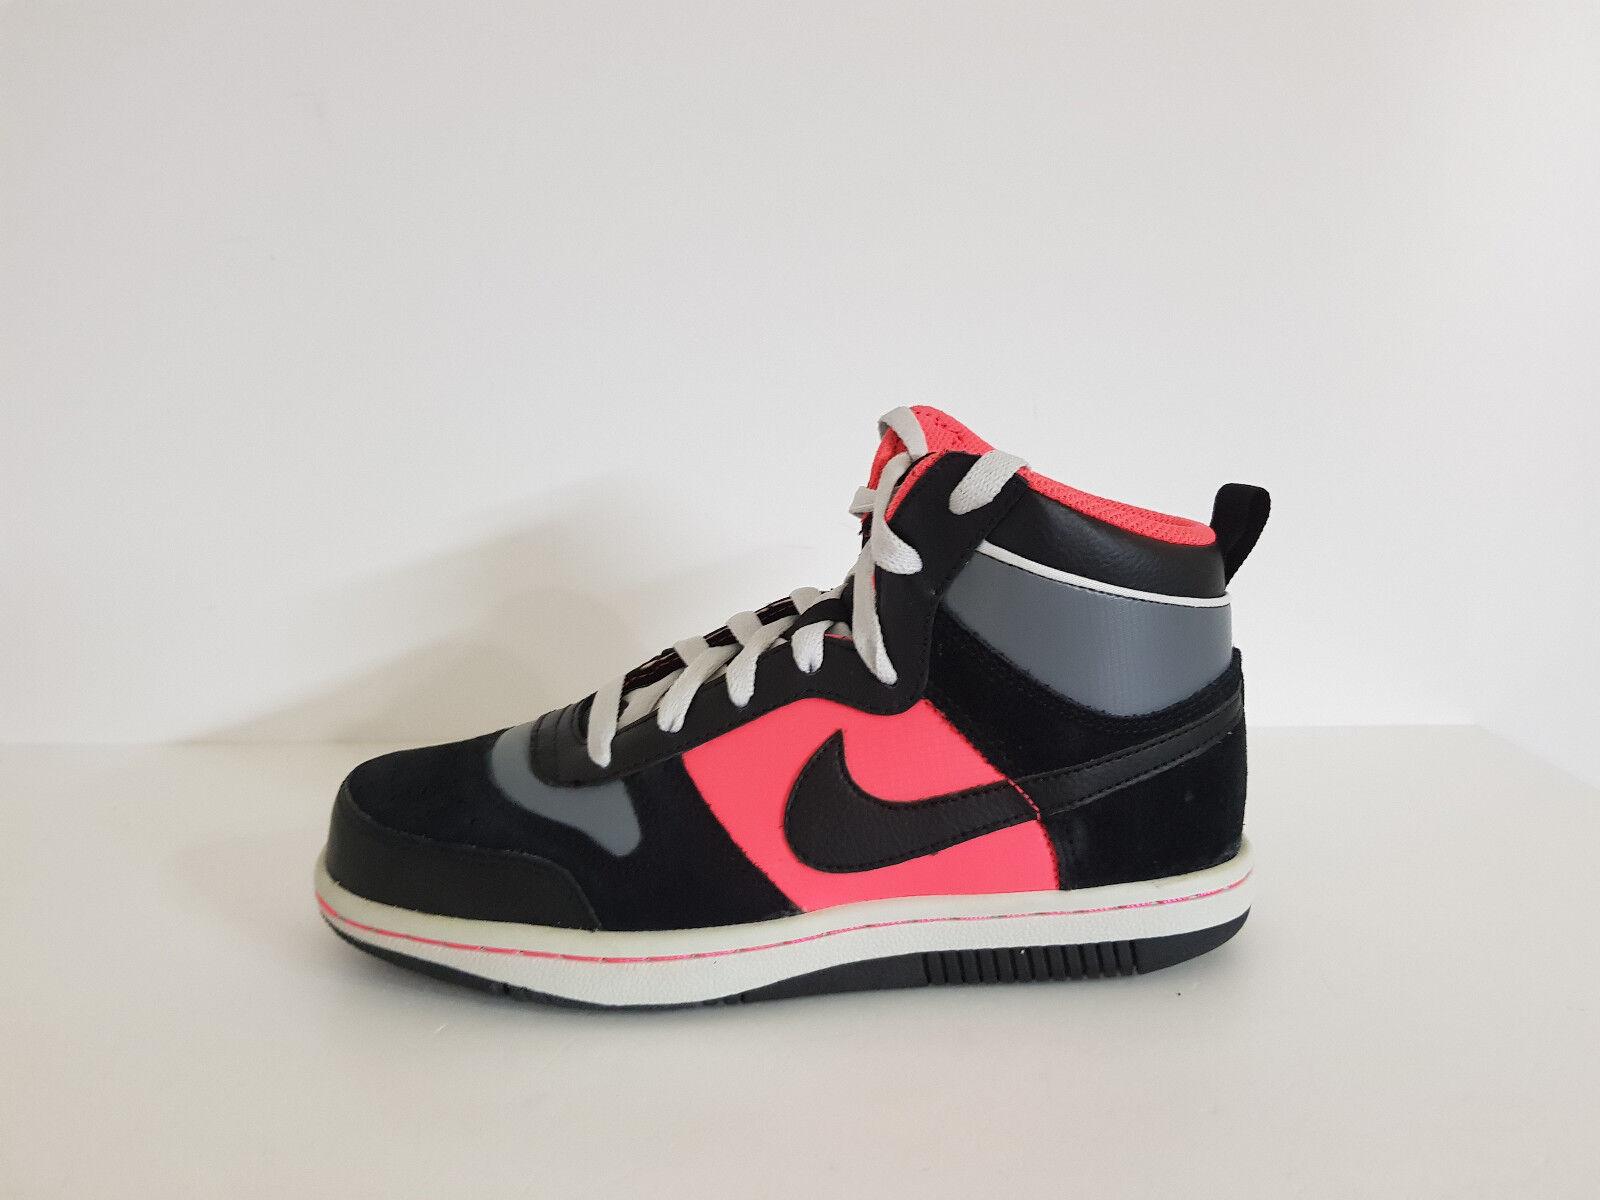 Nike Frau Turnschuhe Rabatt - 60 % art. Sky Team - Far. Mehrfarben